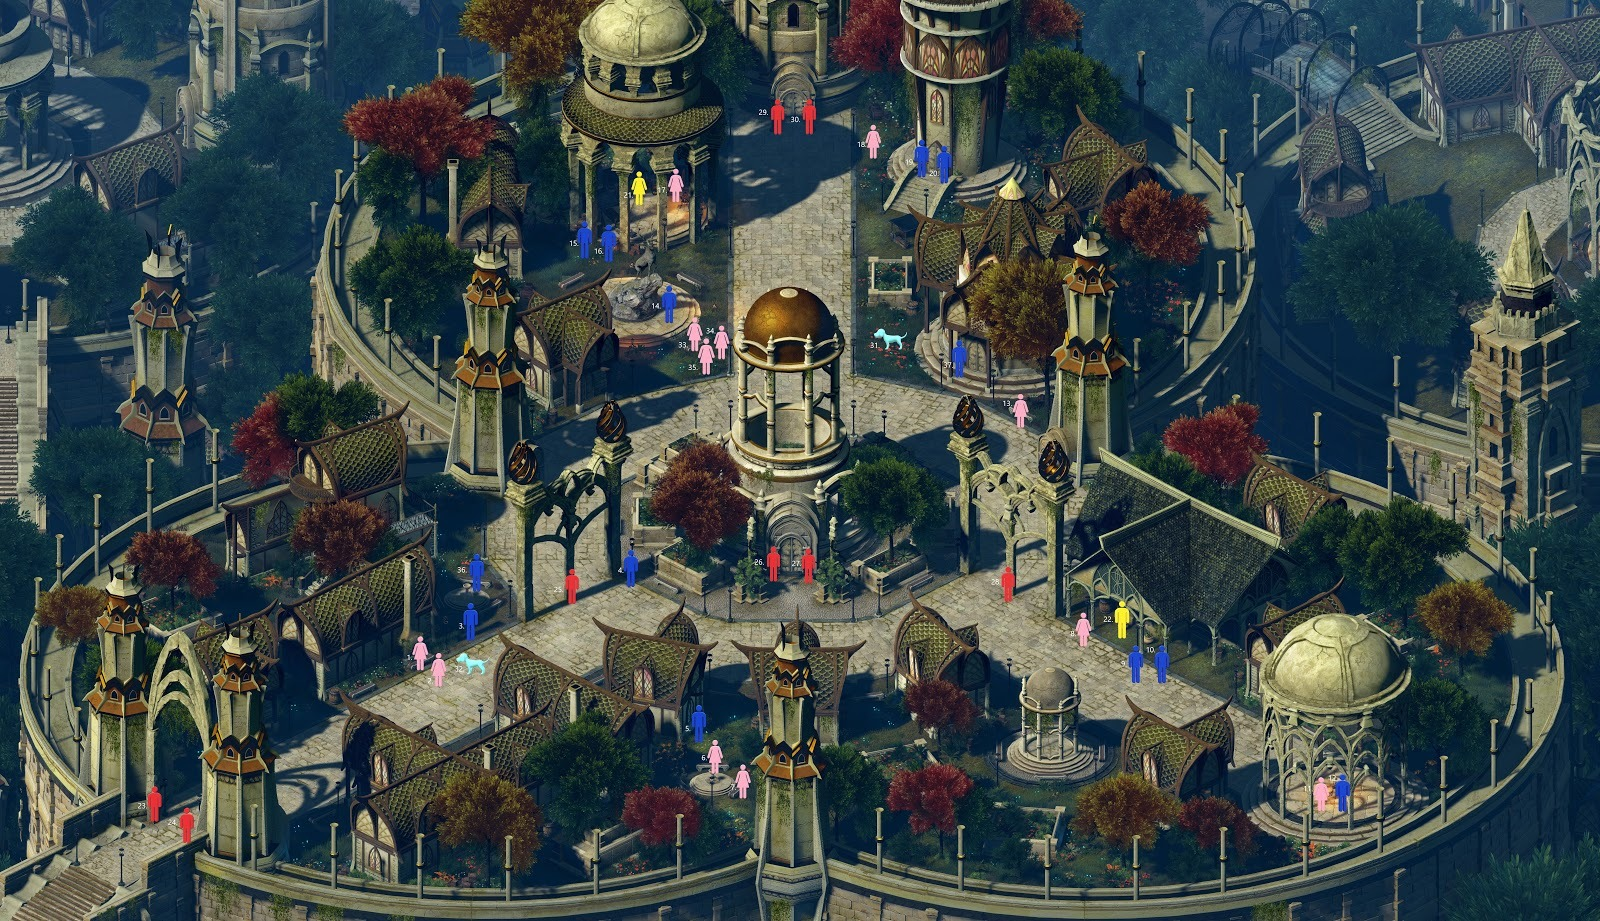 9d3324889ebc9567ba151e1c485534161465fbff | RPG Jeuxvidéo